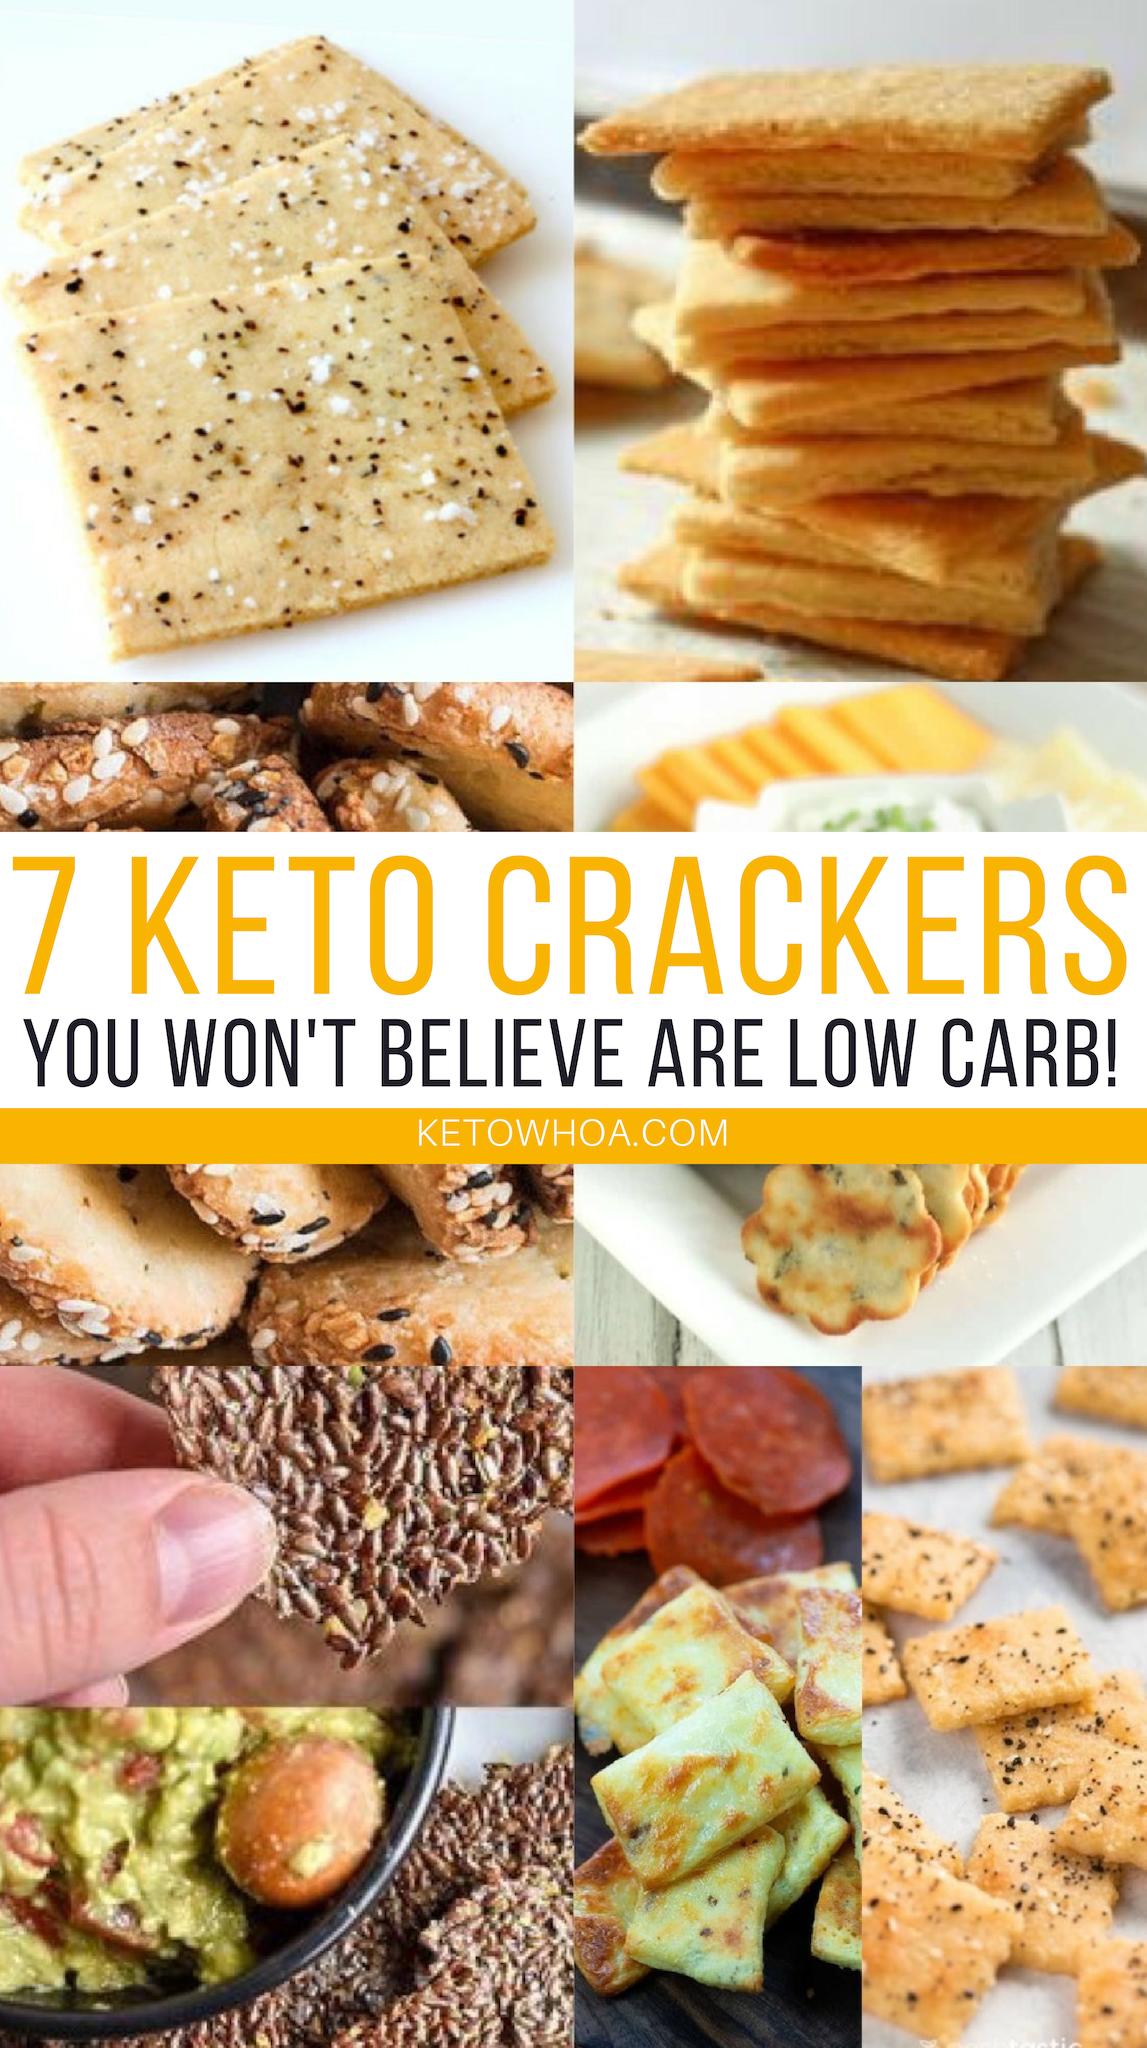 7 Best Low Carb Keto Cracker Recipes That Ll Revolutionize Snack Time Keto Whoa Keto Crackers Recipe Low Carb Keto Vegan Keto Diet